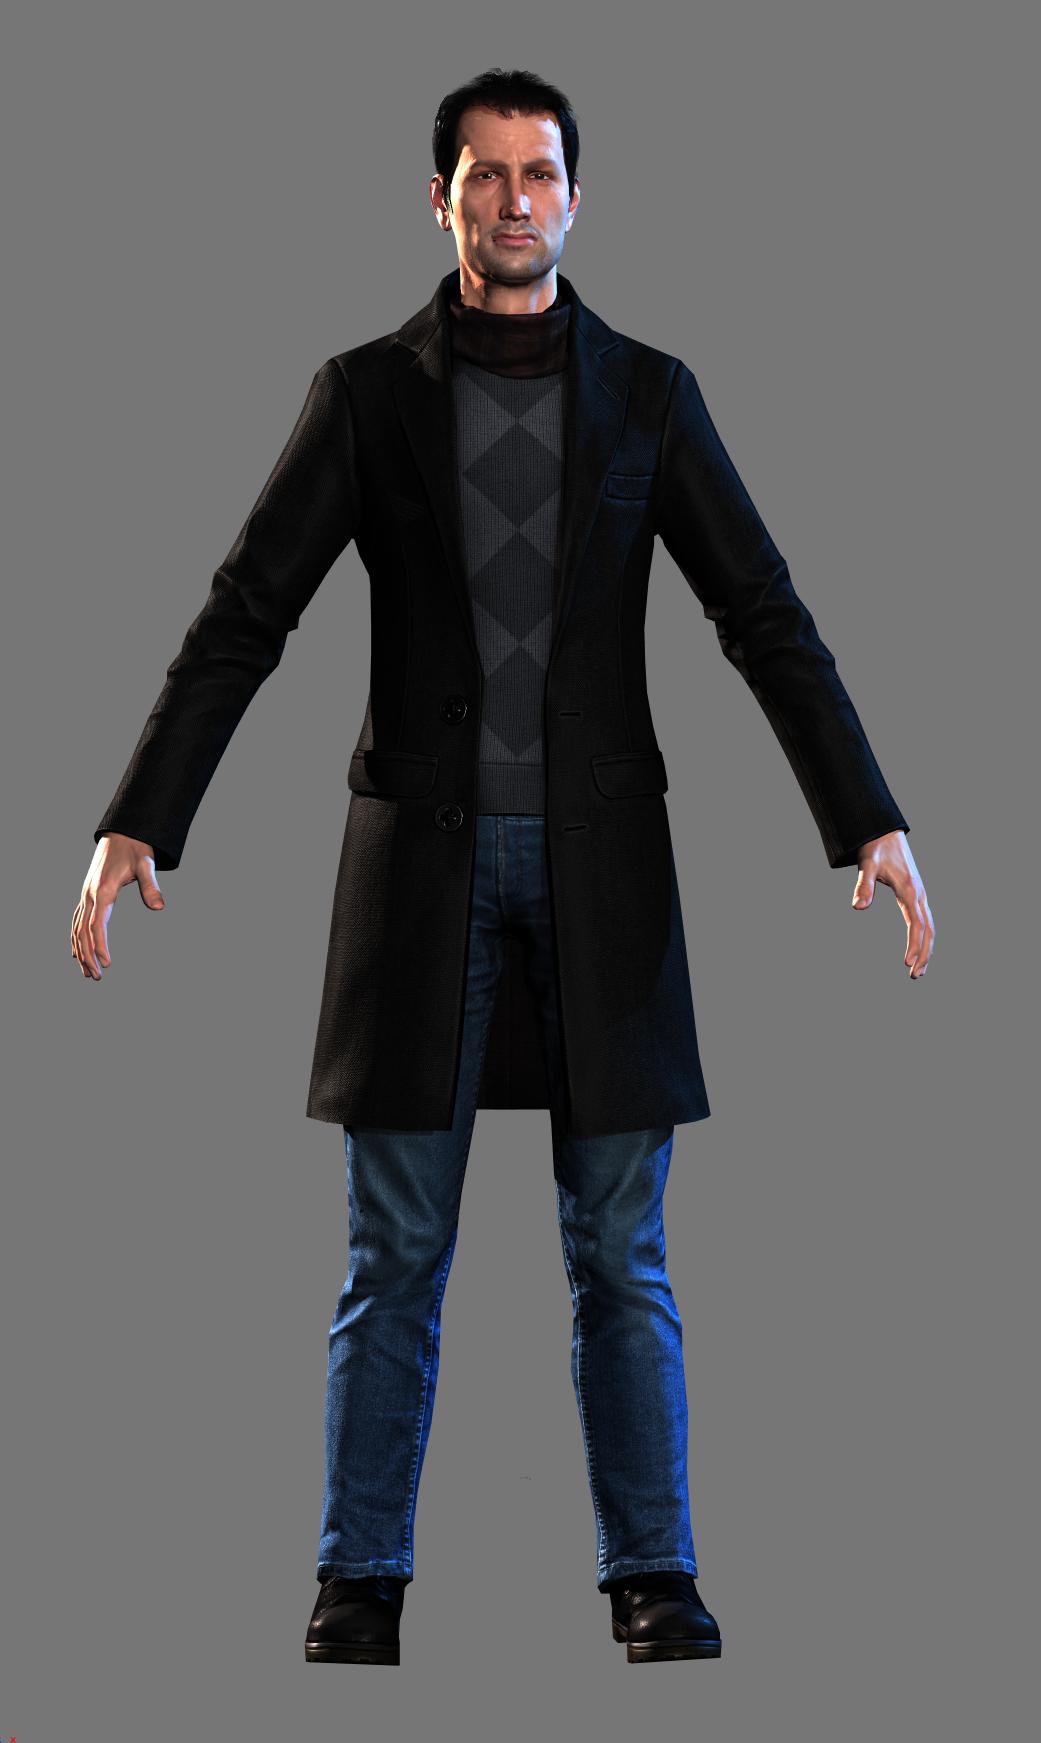 main character sh 083